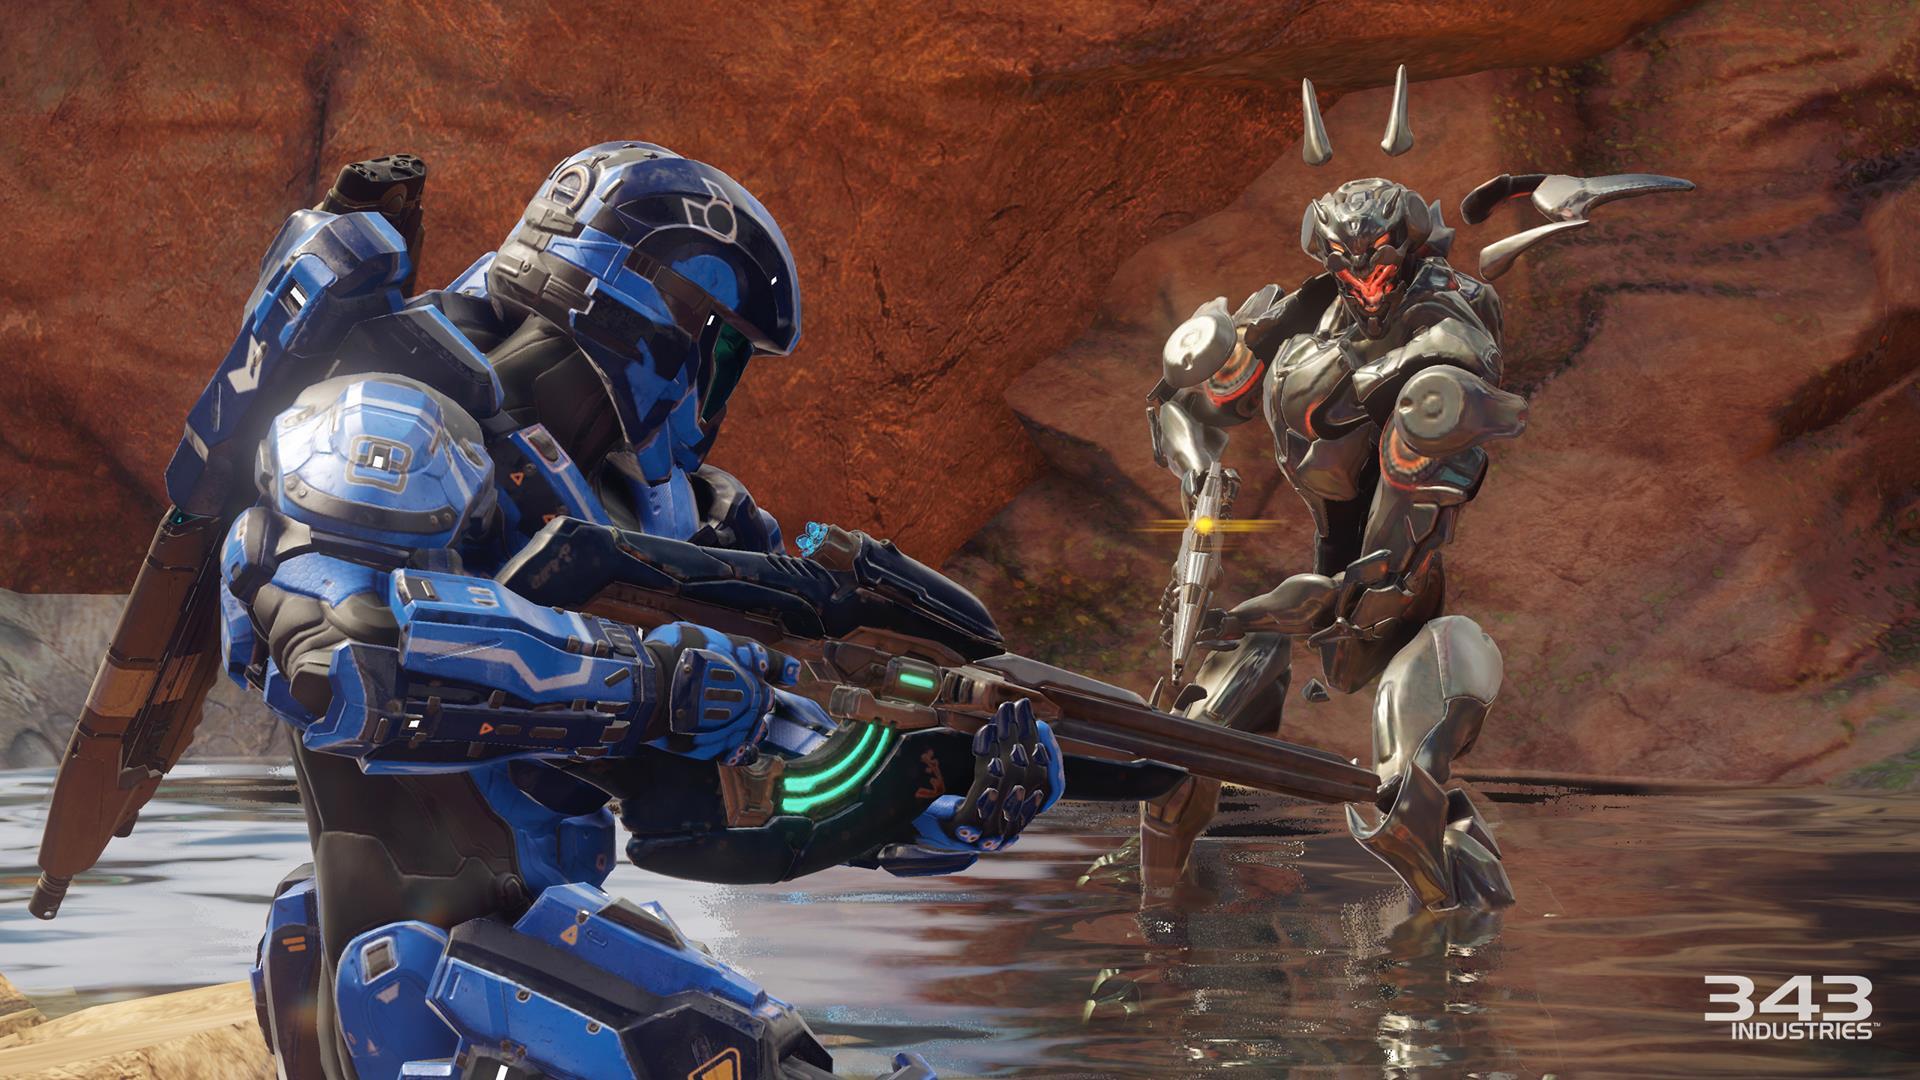 Halo 5 ps4 release date in Brisbane